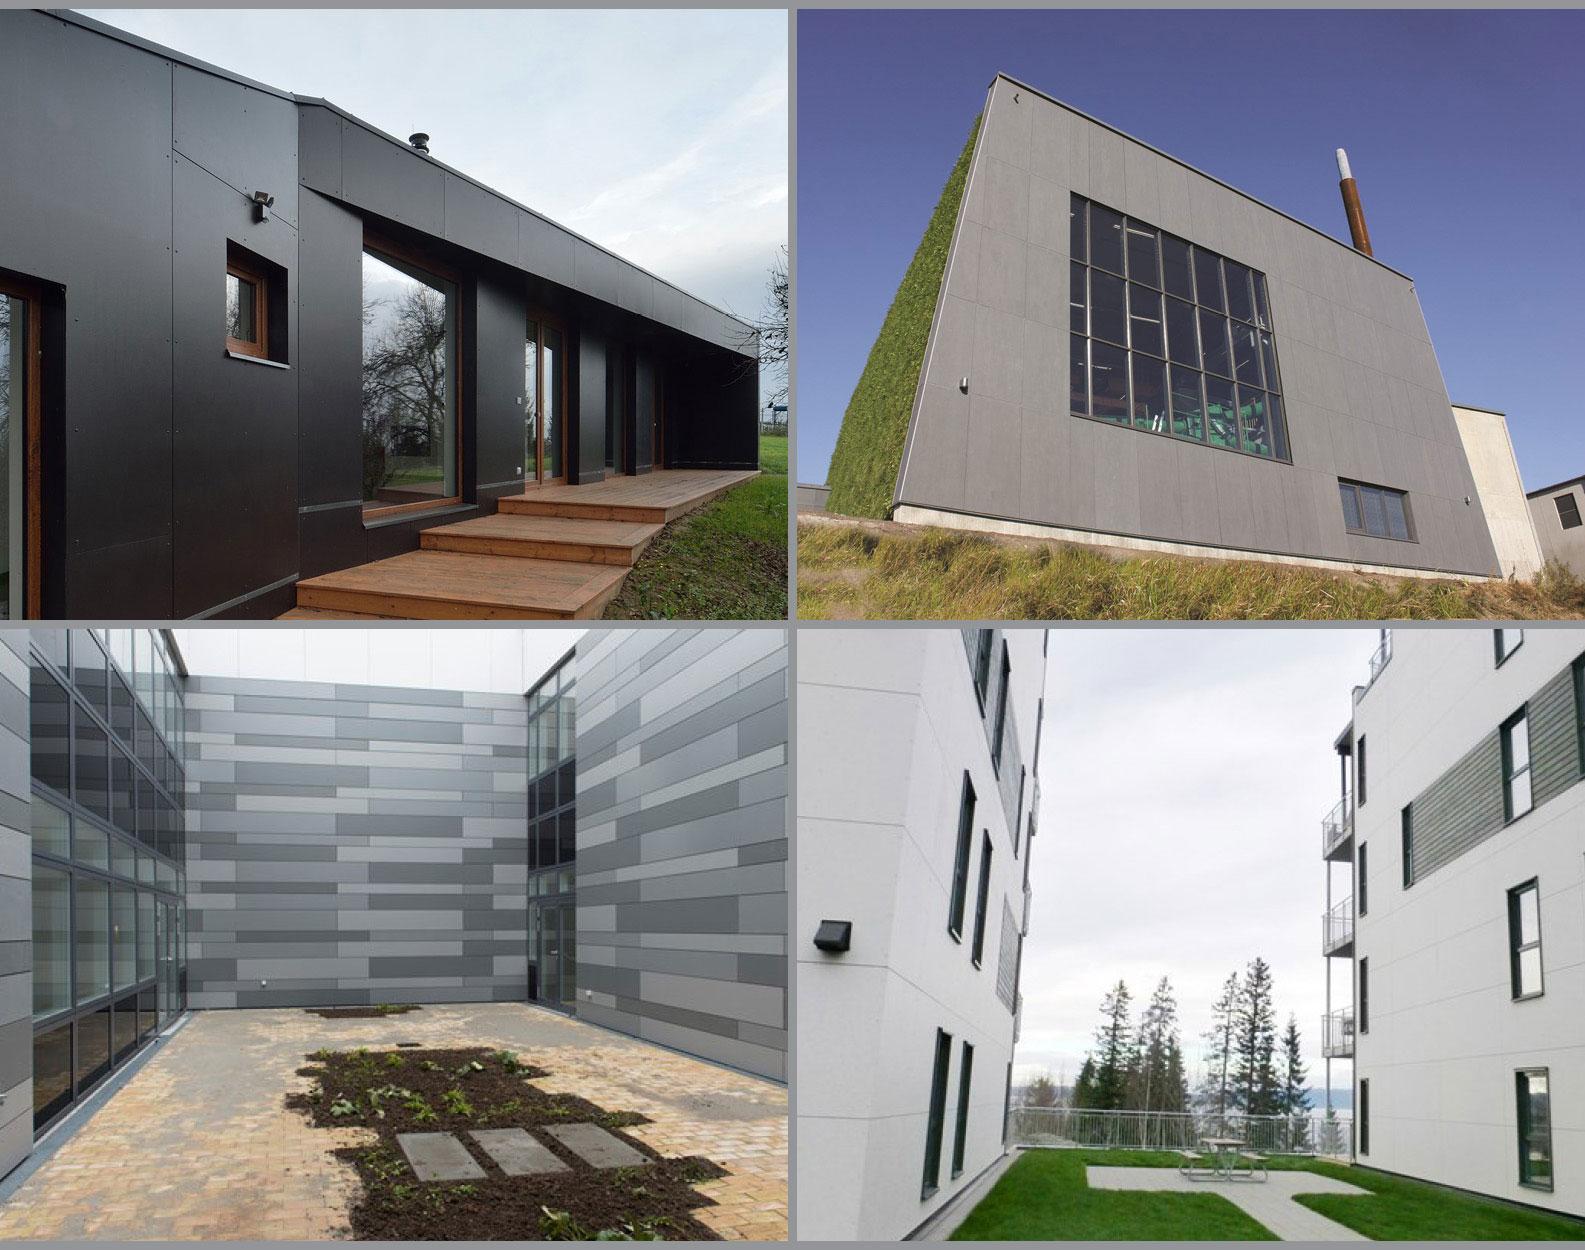 fibre cement cladding examples